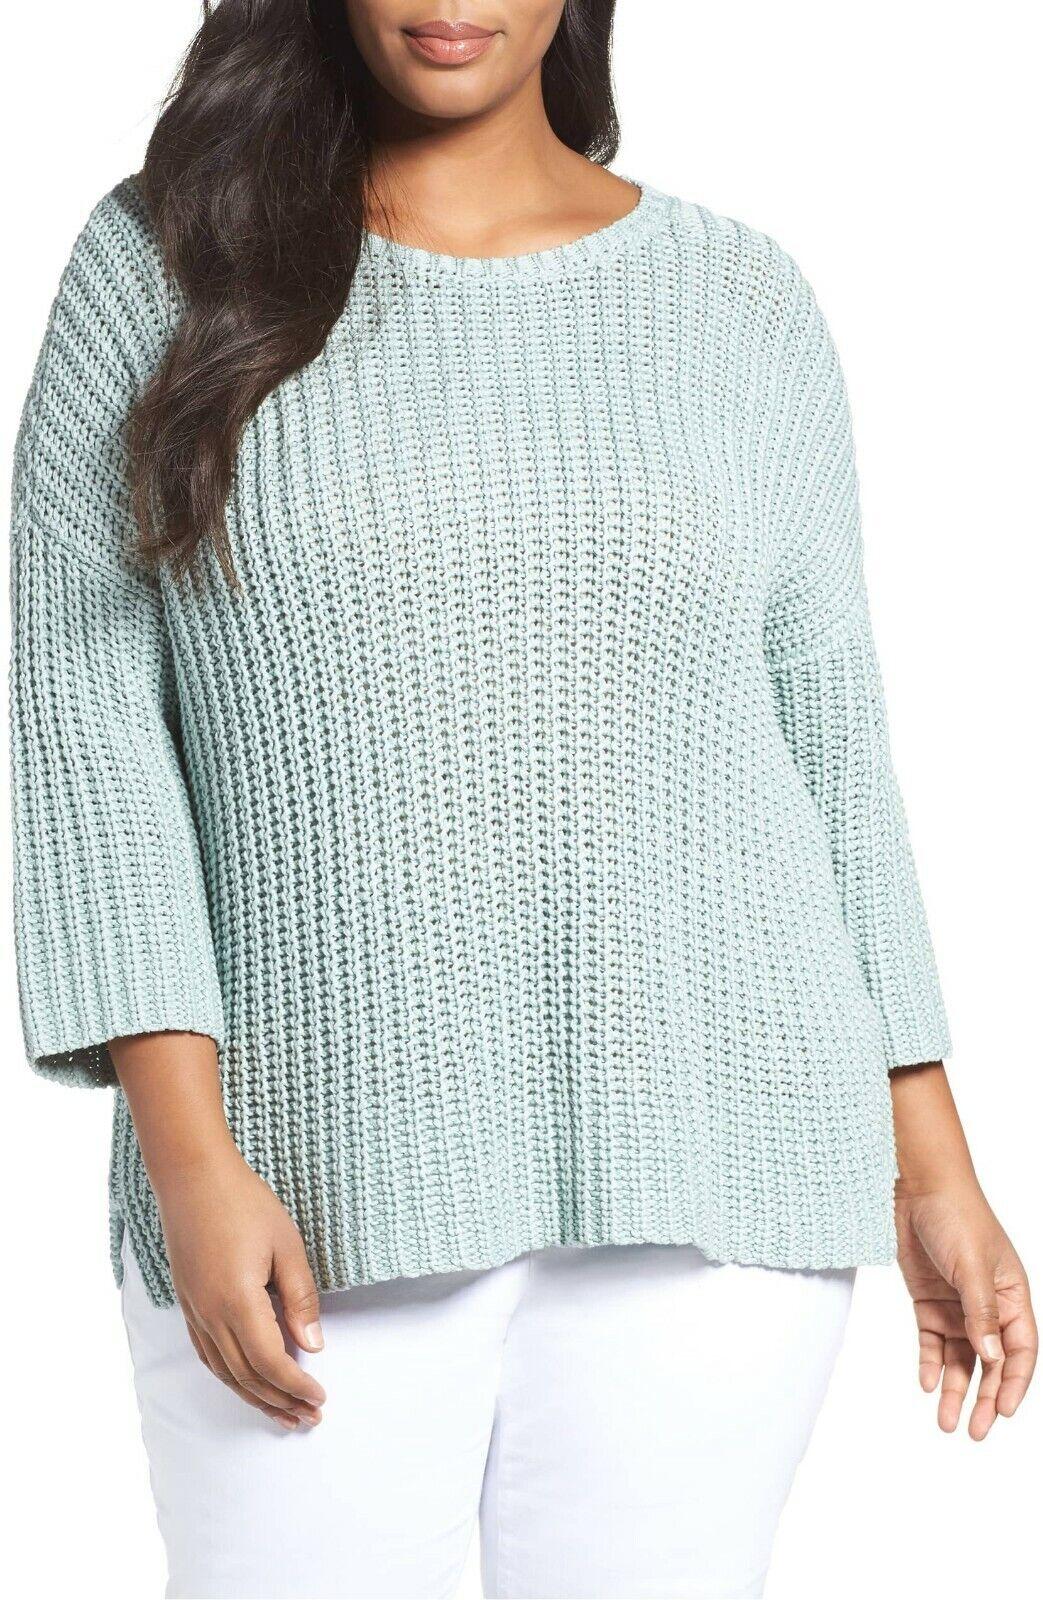 NEW Eileen Fisher Organic Cotton Tape Yarn Sweater BROOK plus size XL